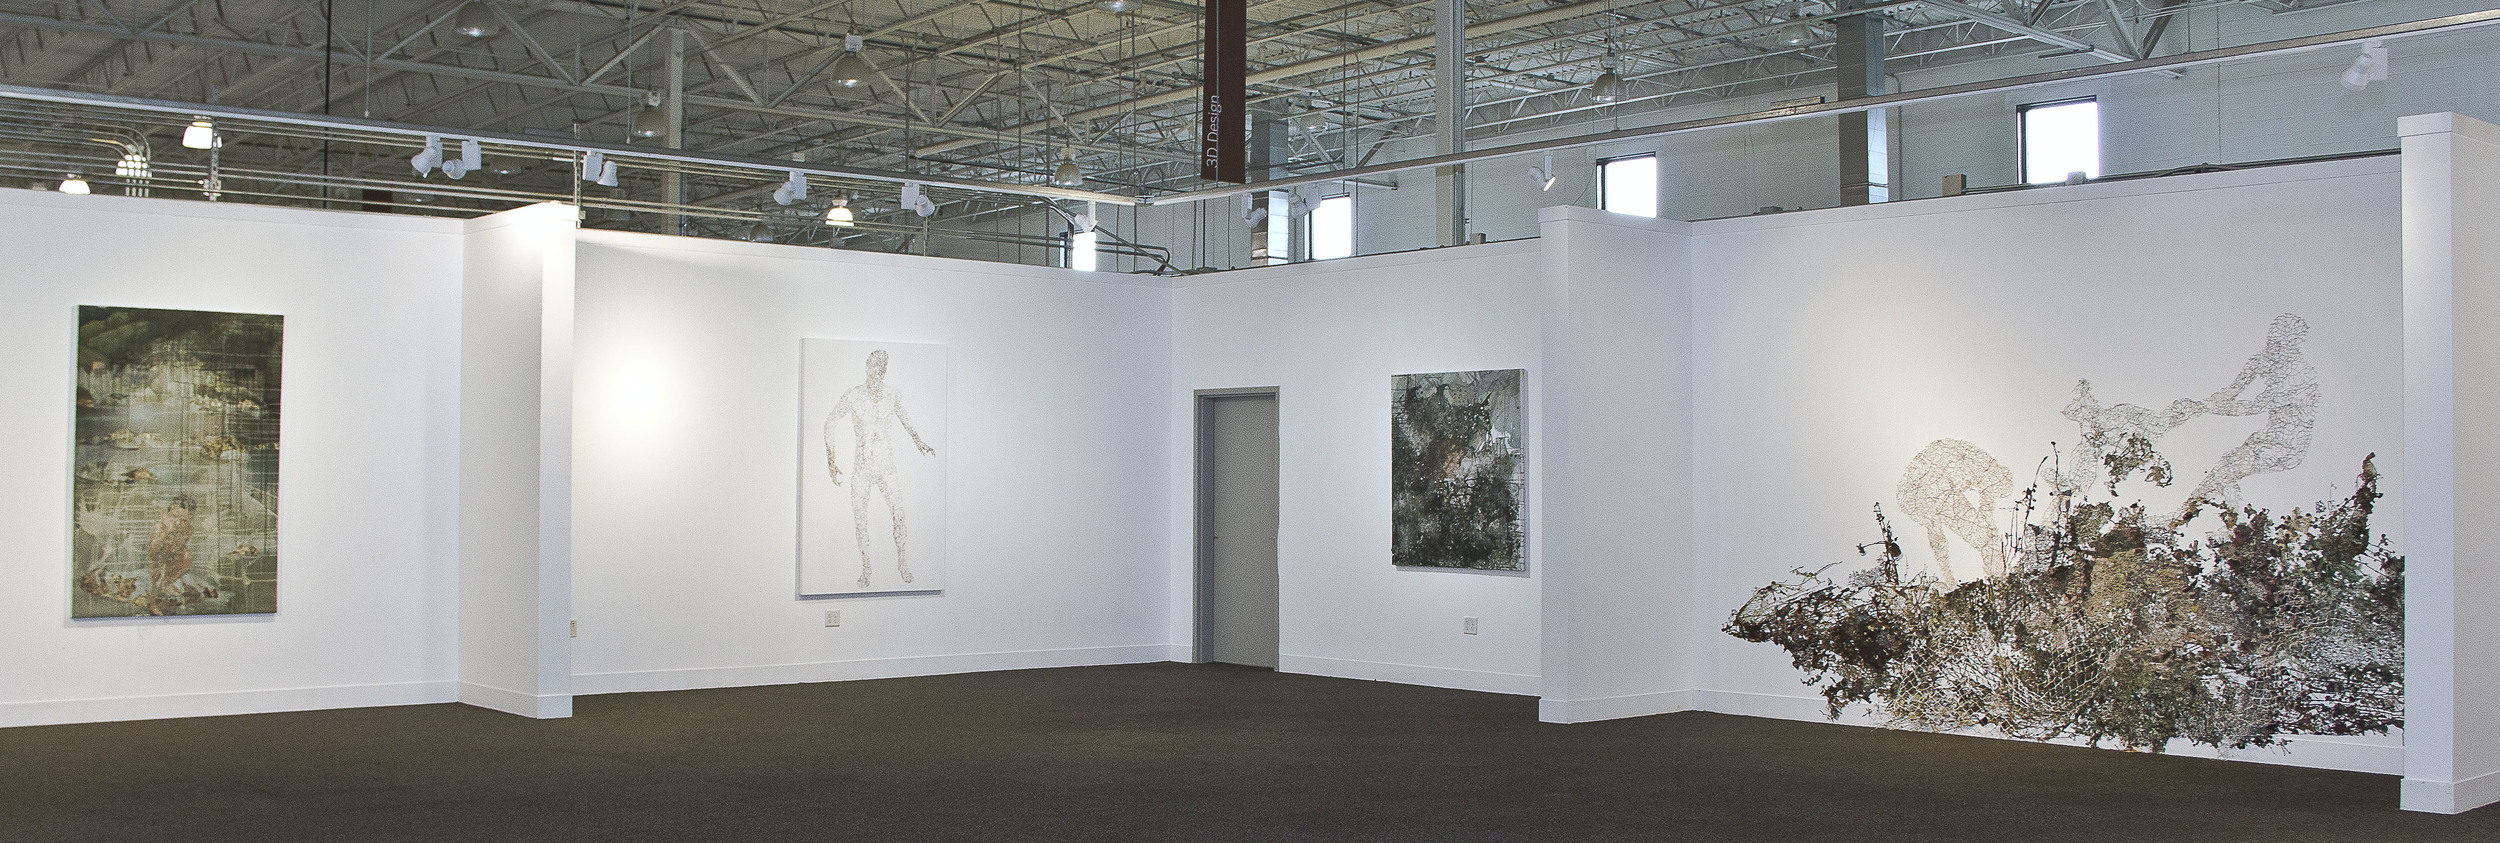 Solo Exhibition  Drewelowe Gallery Iowa City, IA